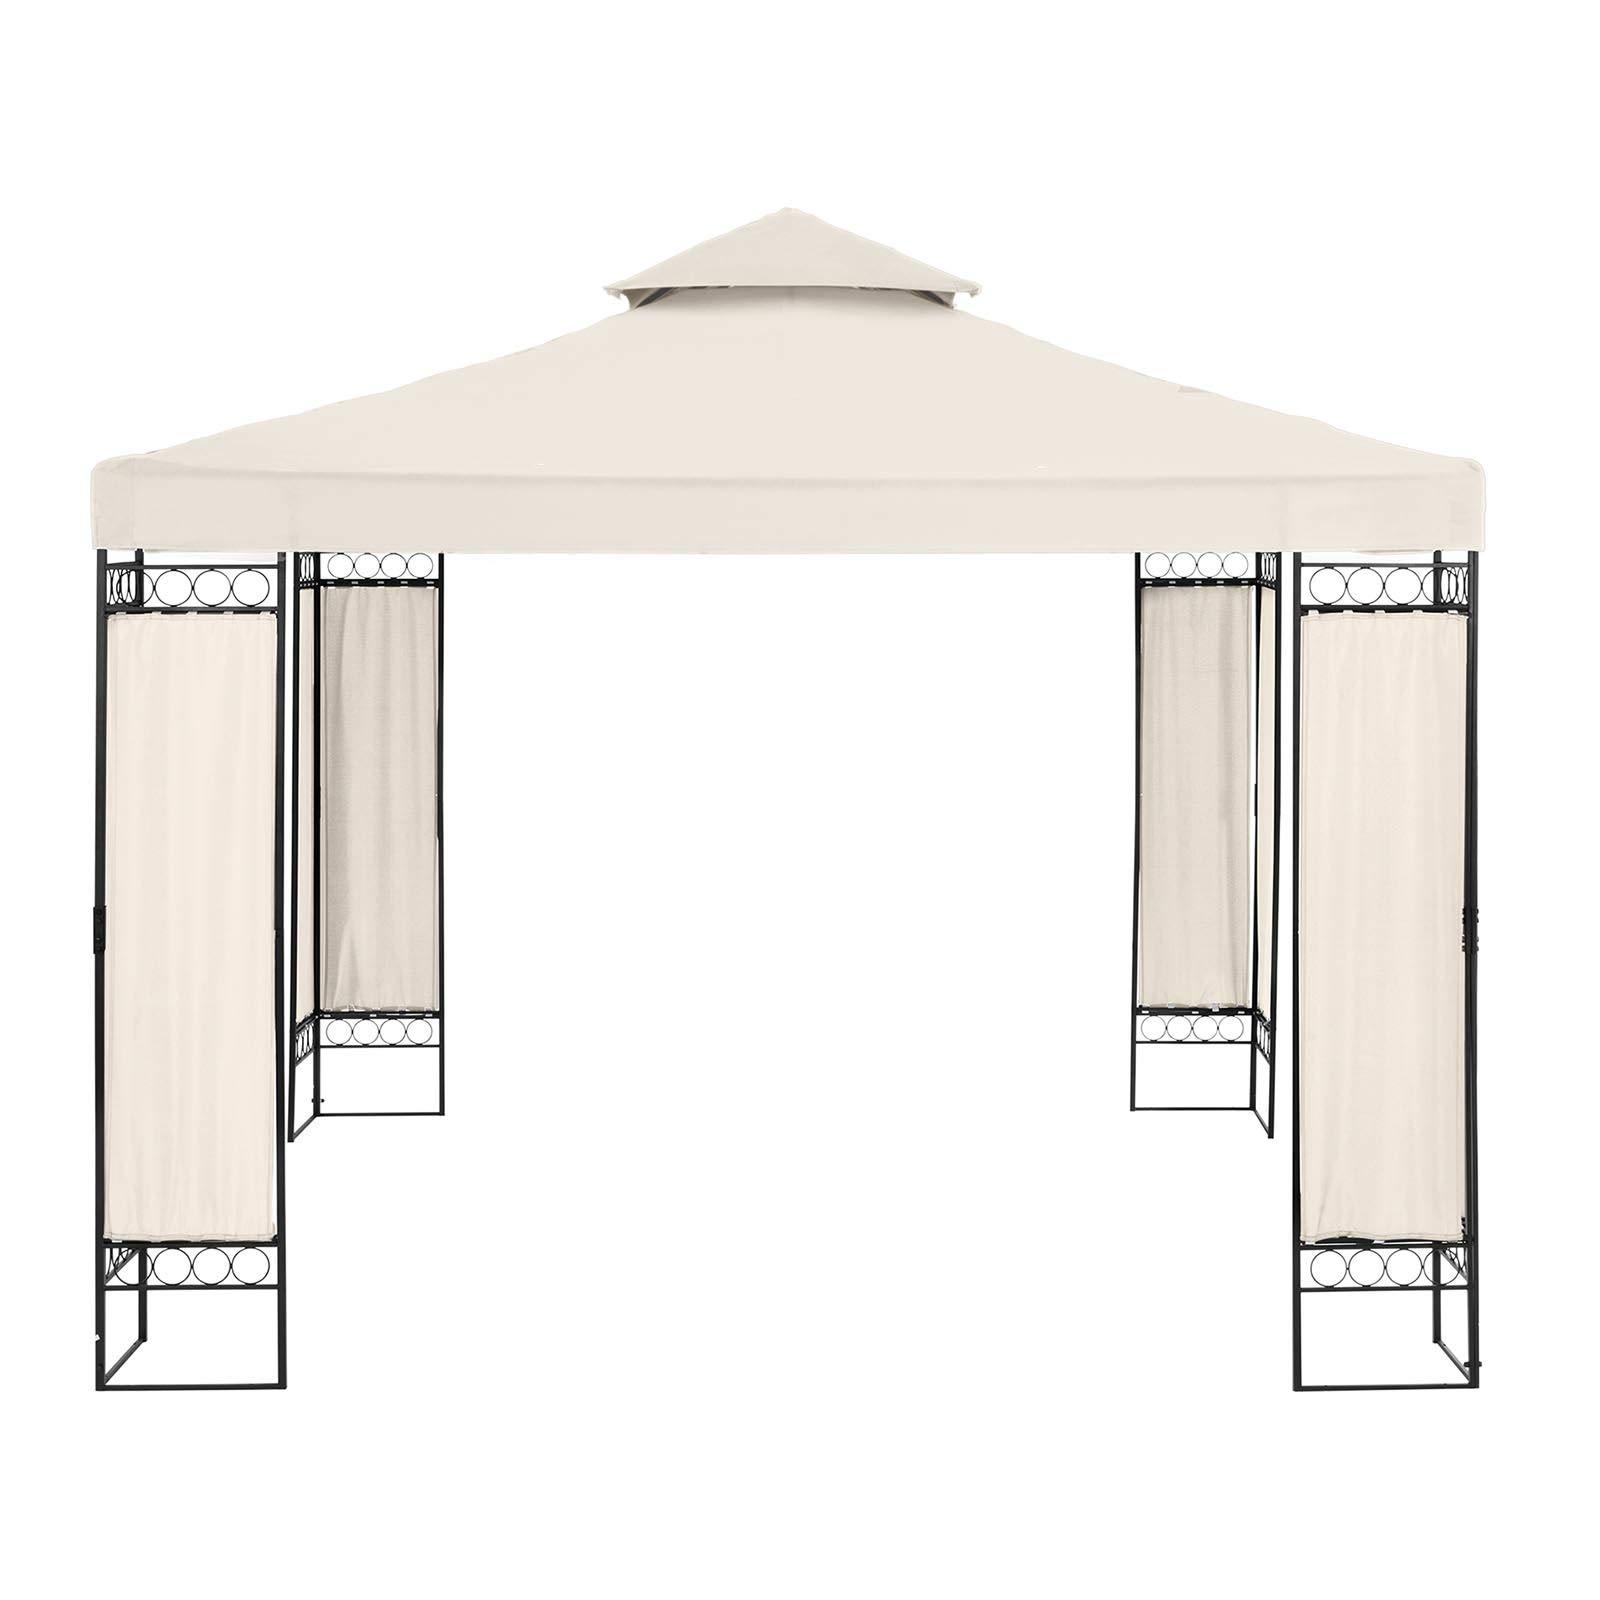 Uniprodo Pérgola De Metal Cenador para Jardín Uni_PERGOLA_3X3BF (Dimensiones: 3 x 3 m, Altura Total: 2, 60 m, Densidad de la Lona: 160 g/m2, Beige): Amazon.es: Jardín